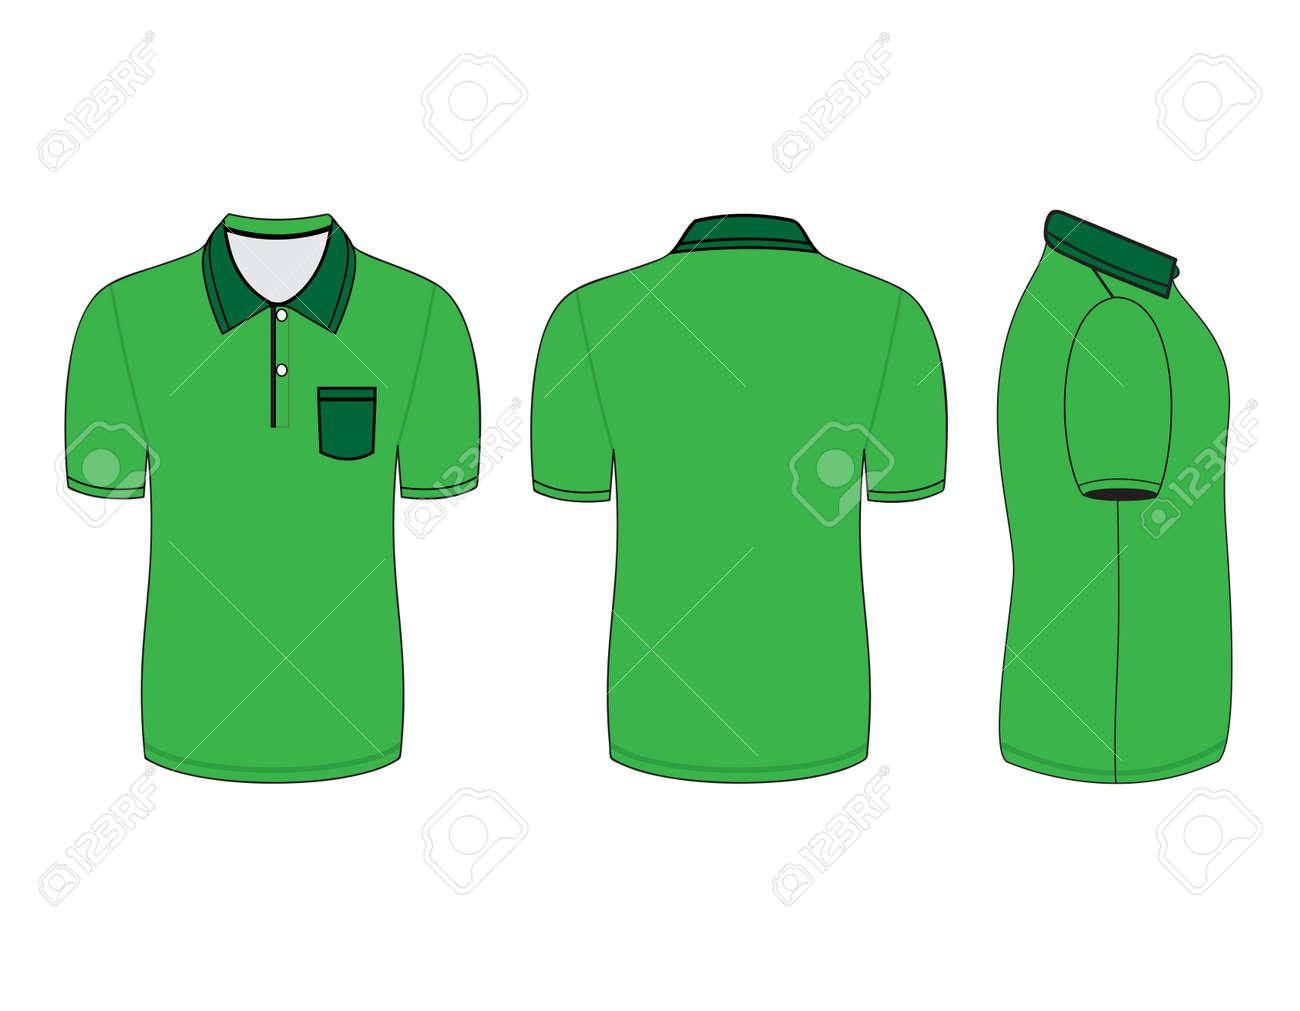 Polo shirt design vector - Polo Shirt Design Templates Front Back And Side Views Vector Illustration Stock